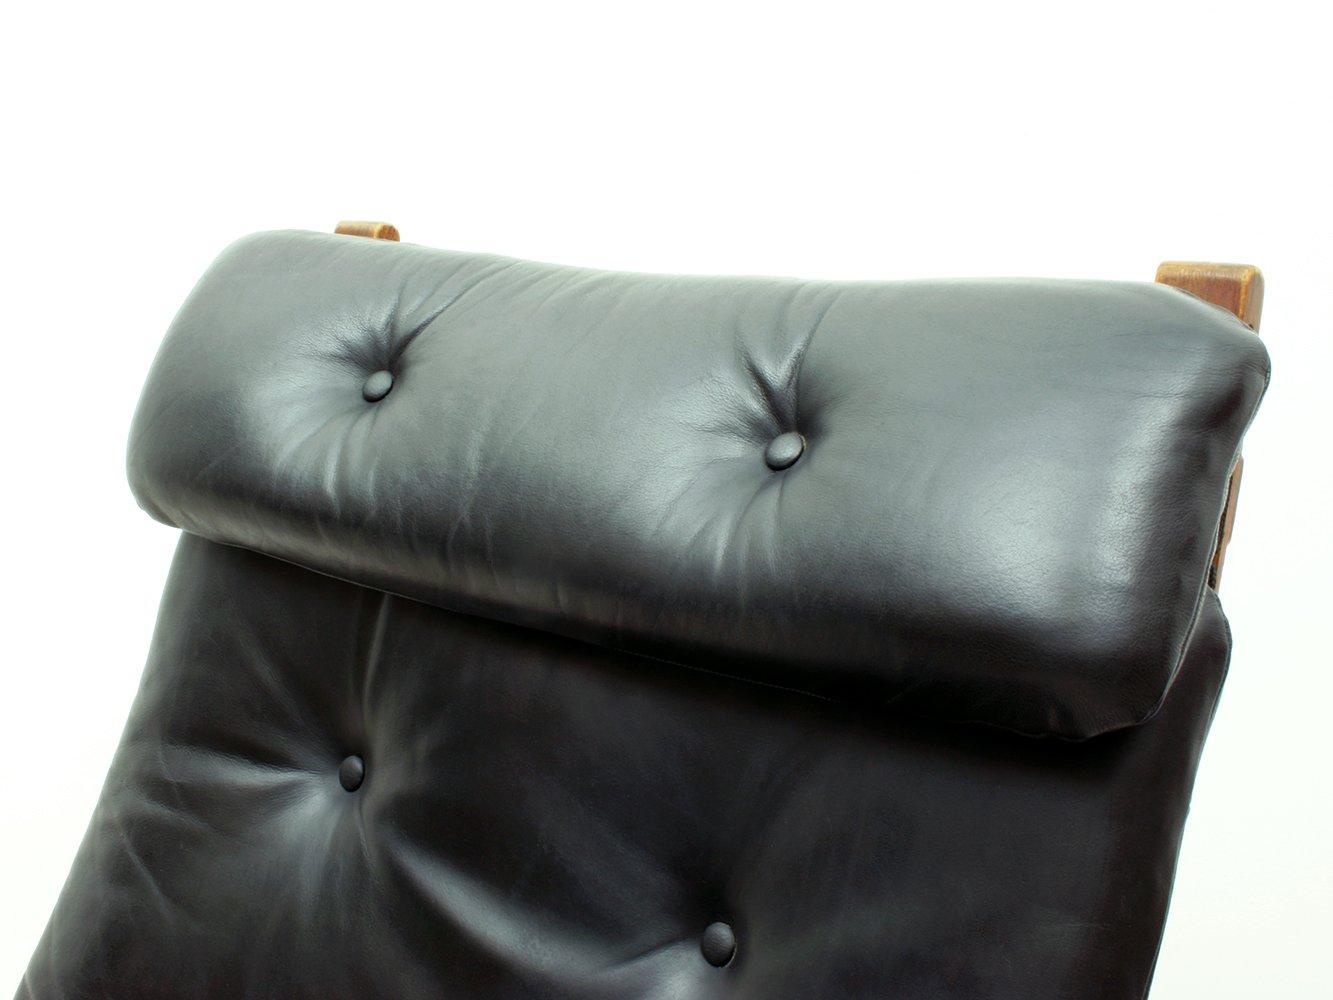 Norwegian Siesta Plywood Amp Leather Lounge Chair Amp Ottoman